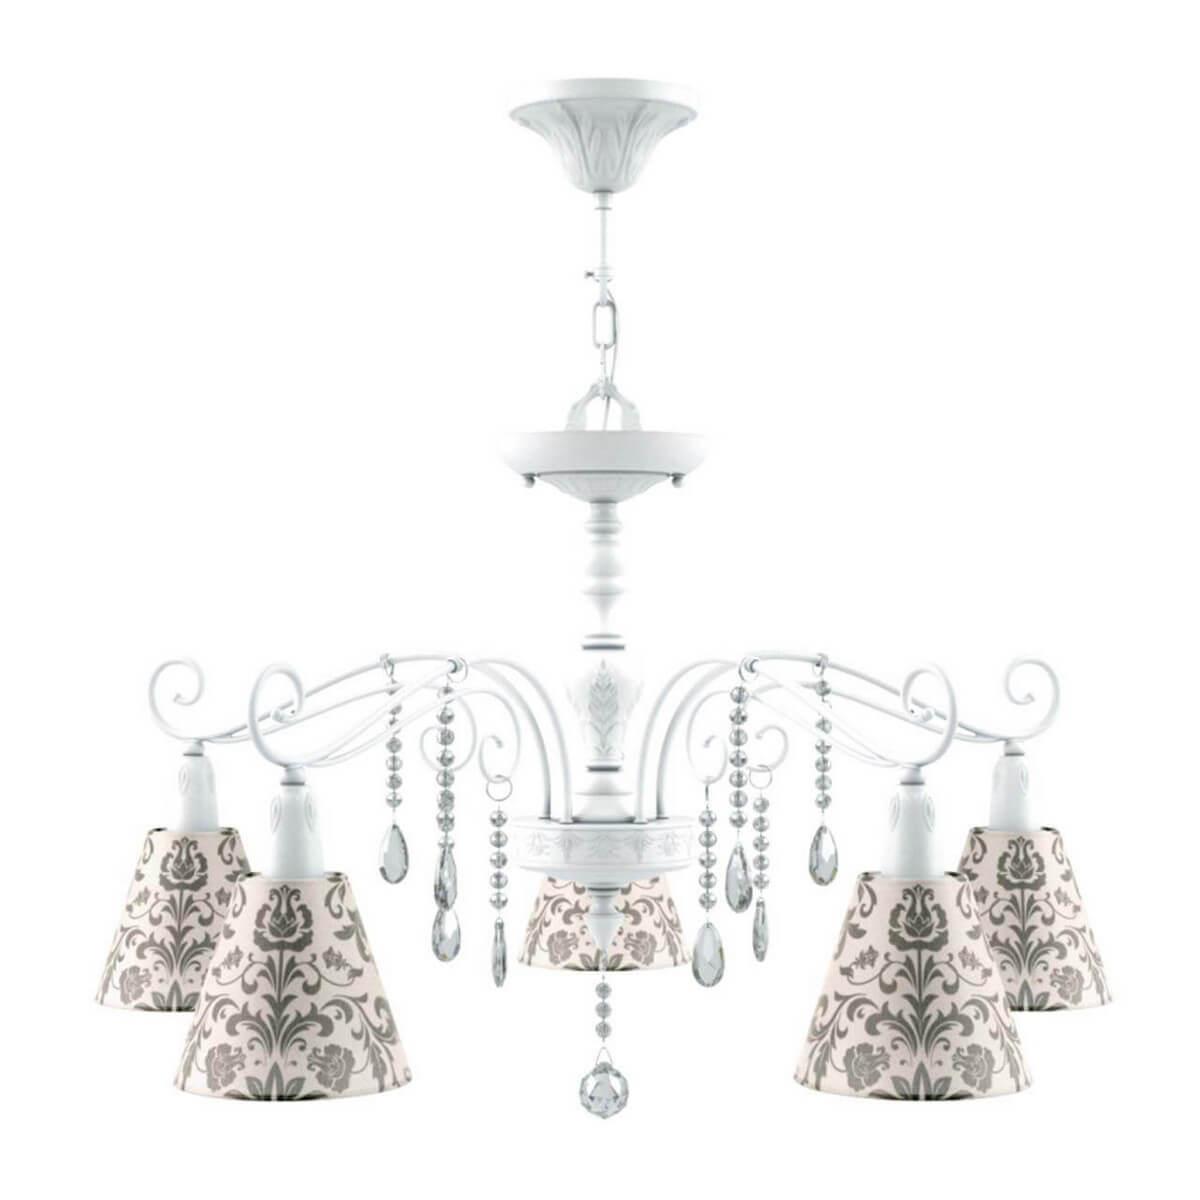 цена на Люстра Lamp4you E4-05-WM-LMP-O-1-CRL-E4-05-TR-DN Provence